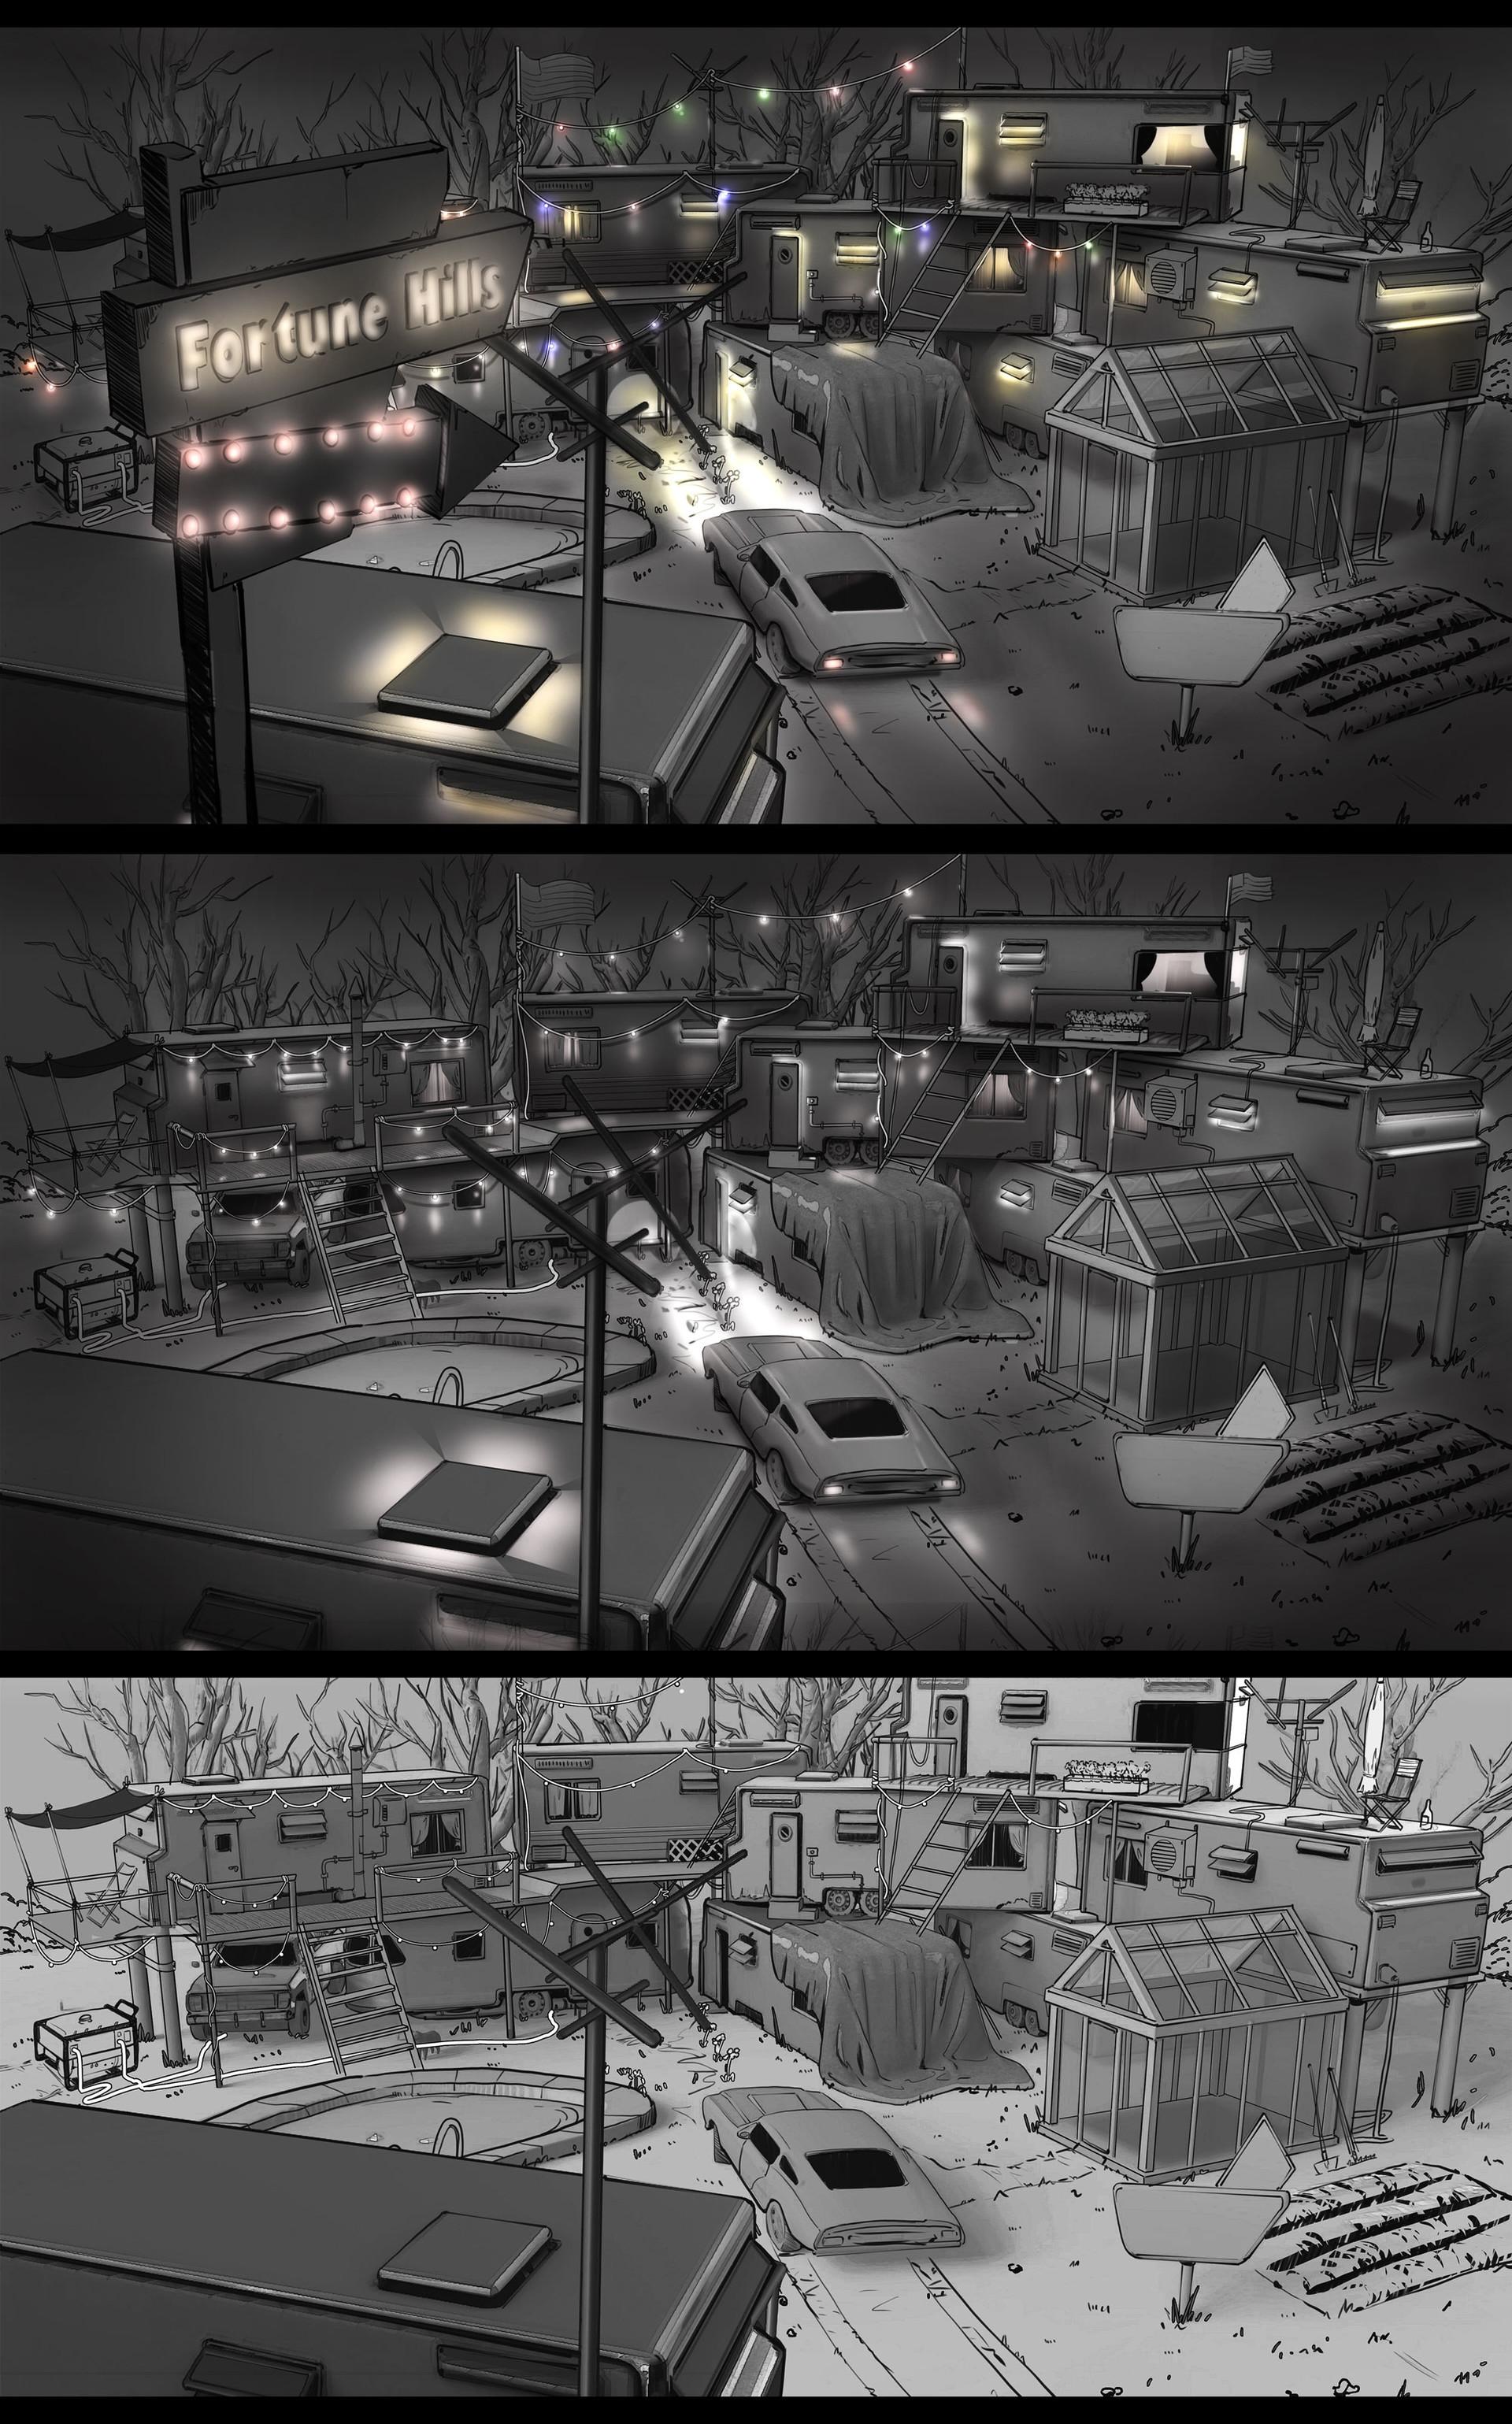 Timo peter a13 trailerpark lighting kontrast